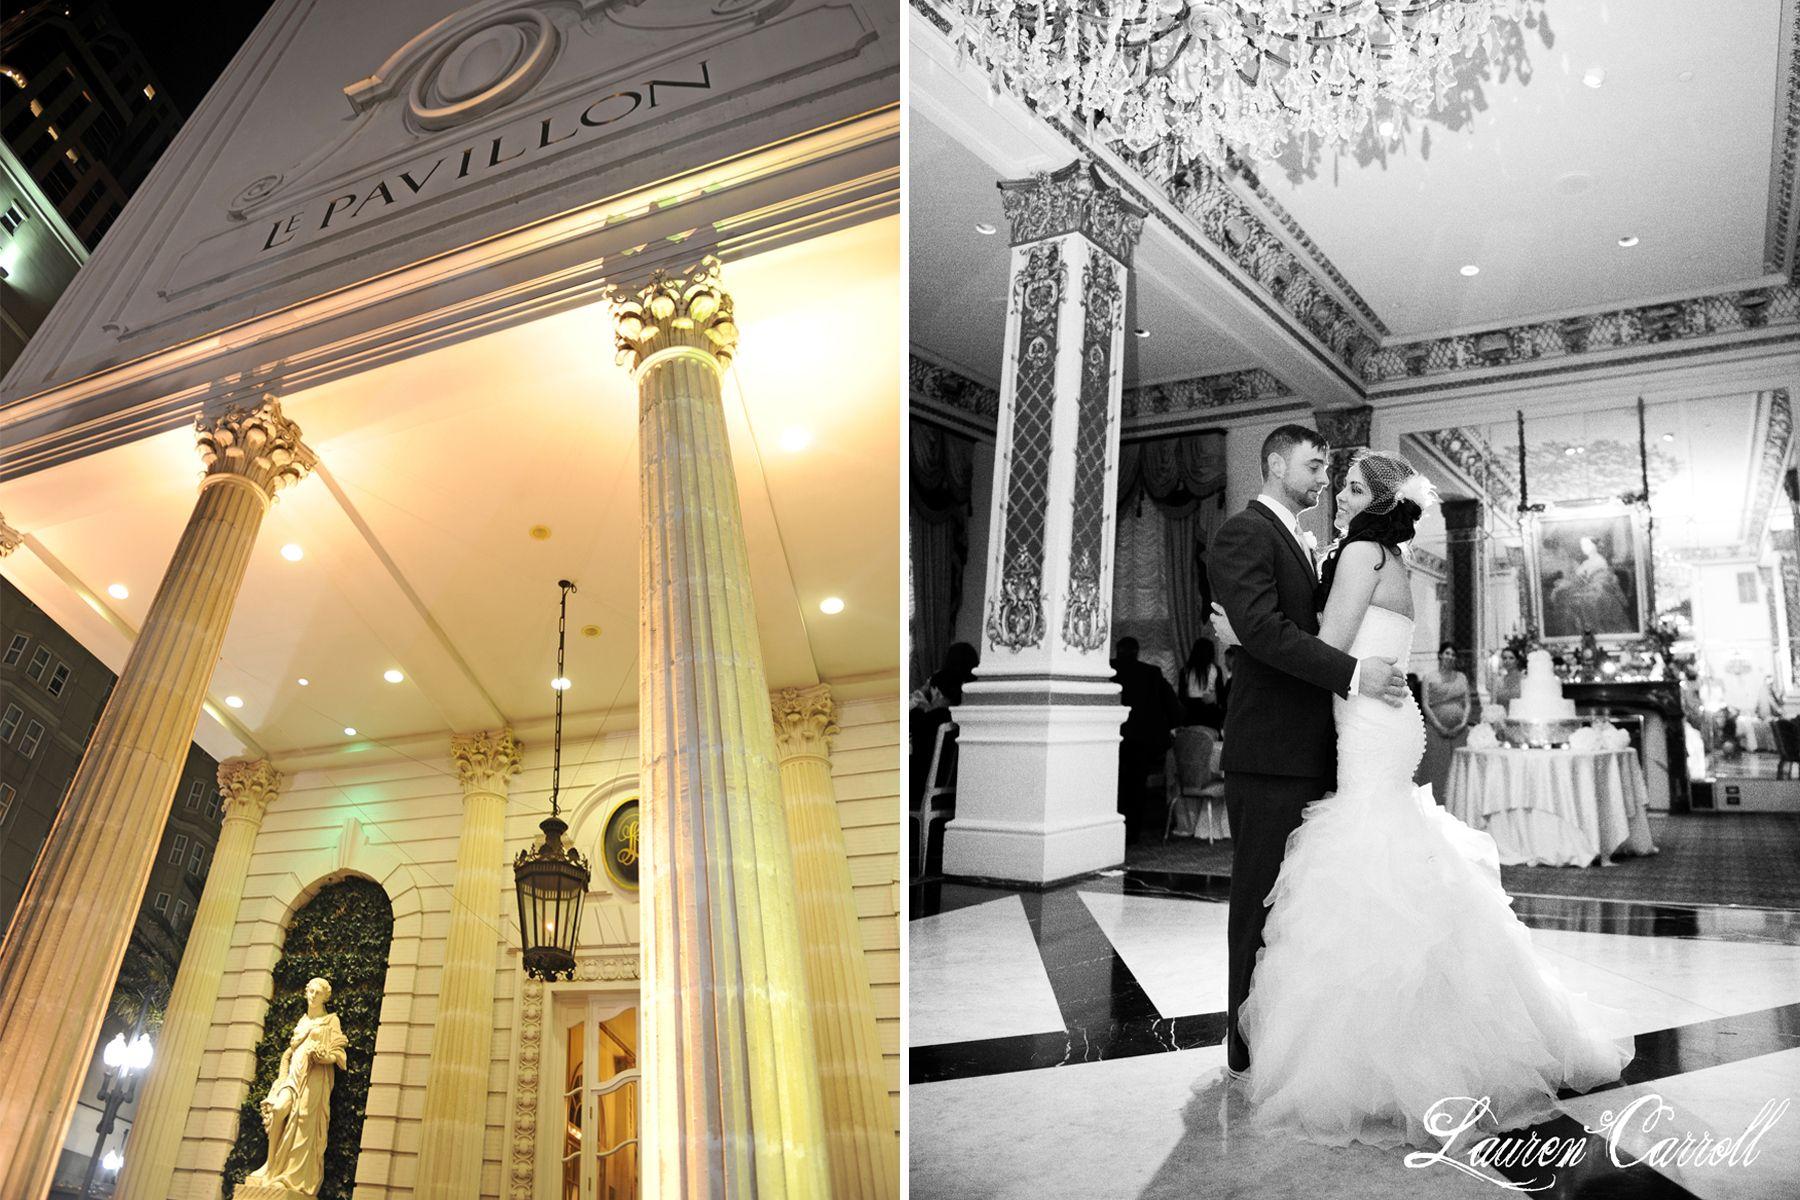 Lauren Carroll Photography Laurencarrollphotography New Orleans Wedding Venue Hotel Le Pavillon